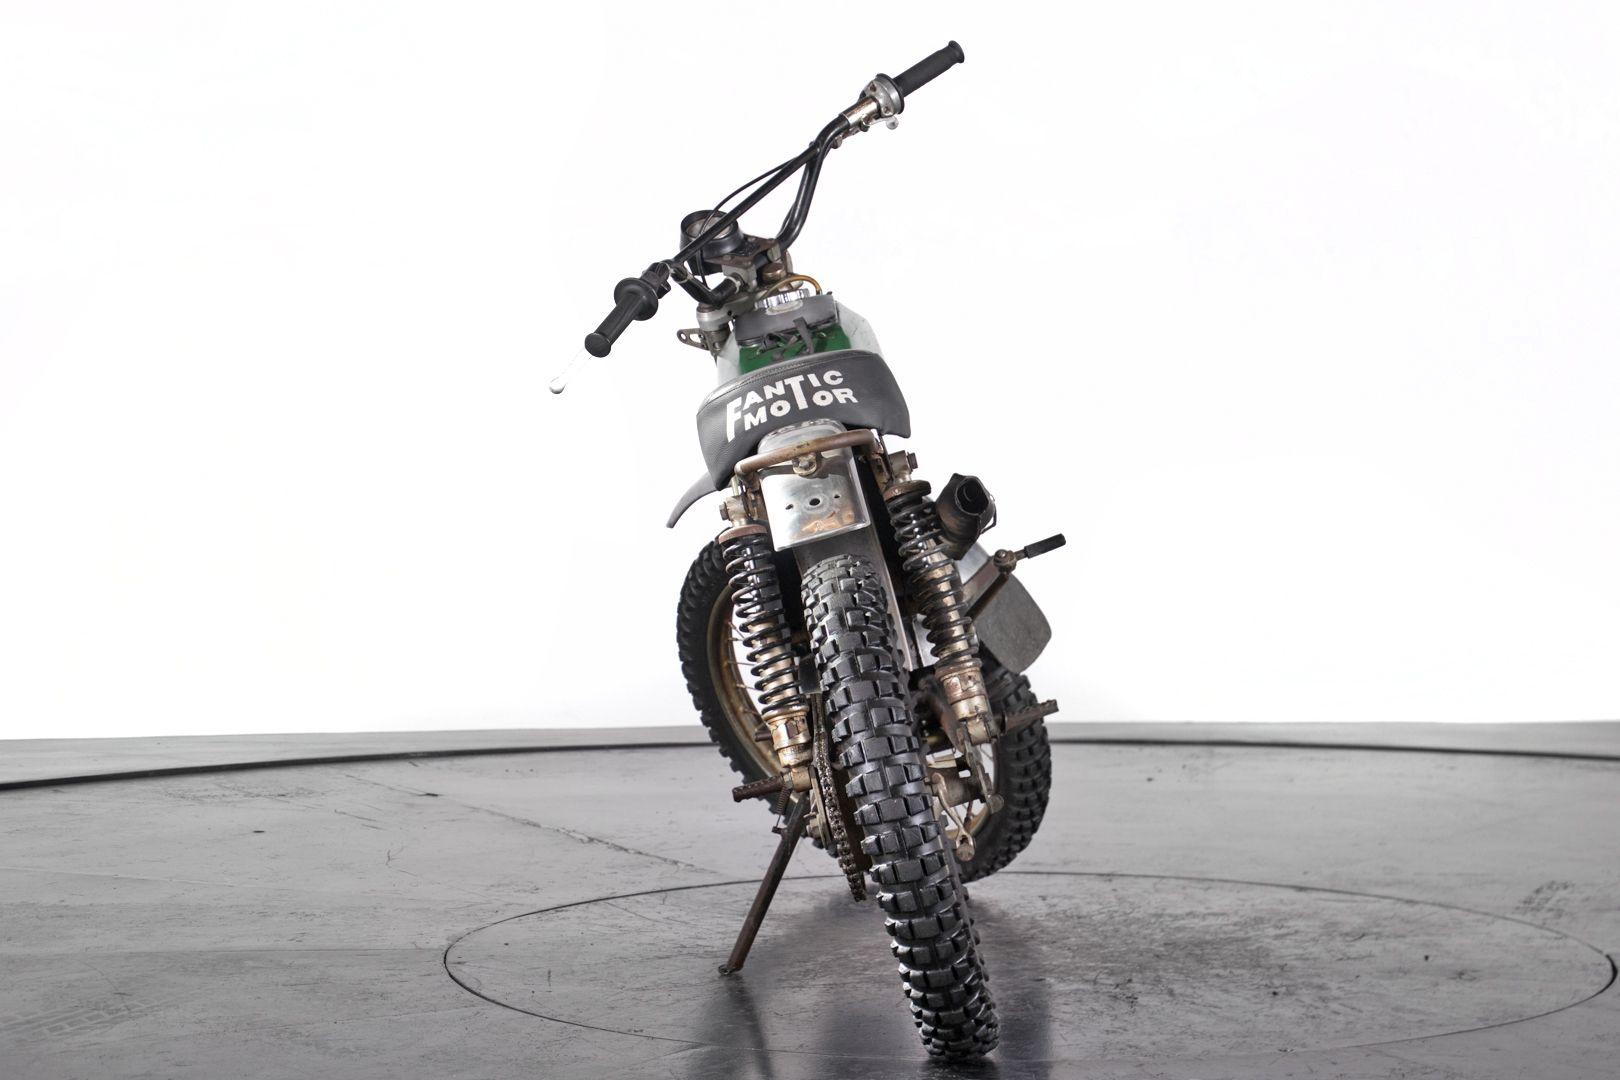 1971 FANTIC MOTOR CABALLERO 100 CROSS TX92 53138